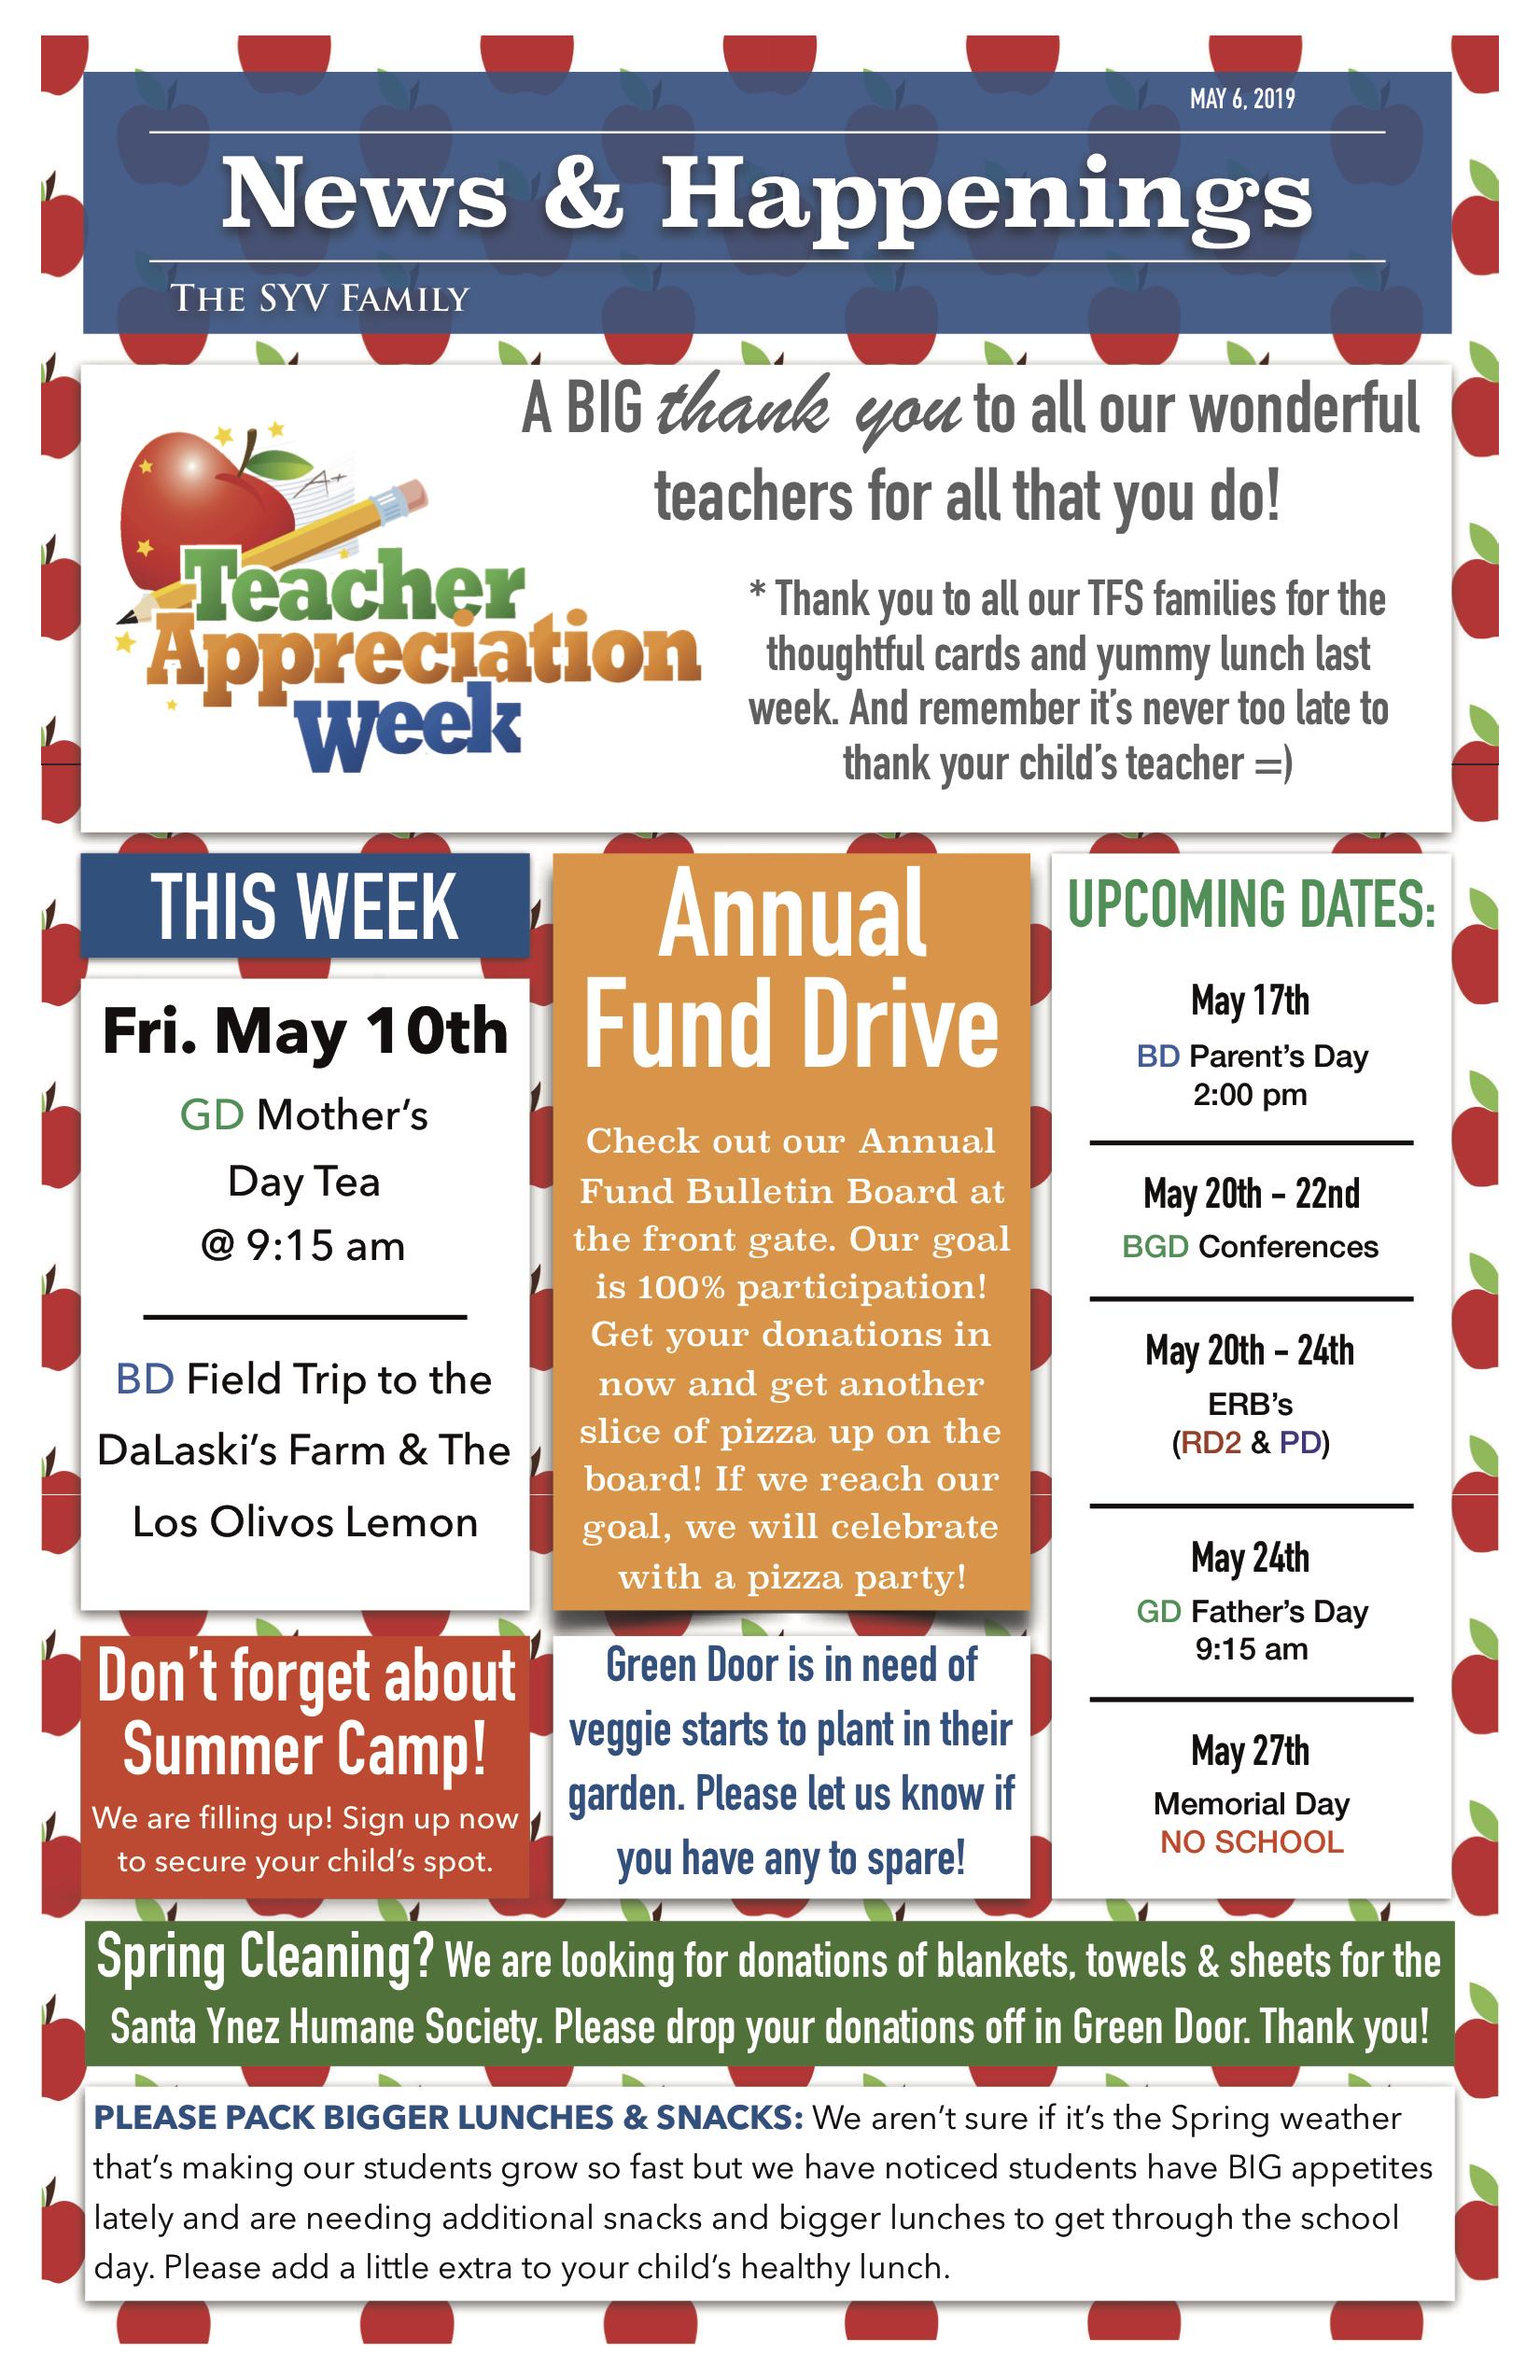 TFS News & Happenings | The Family School